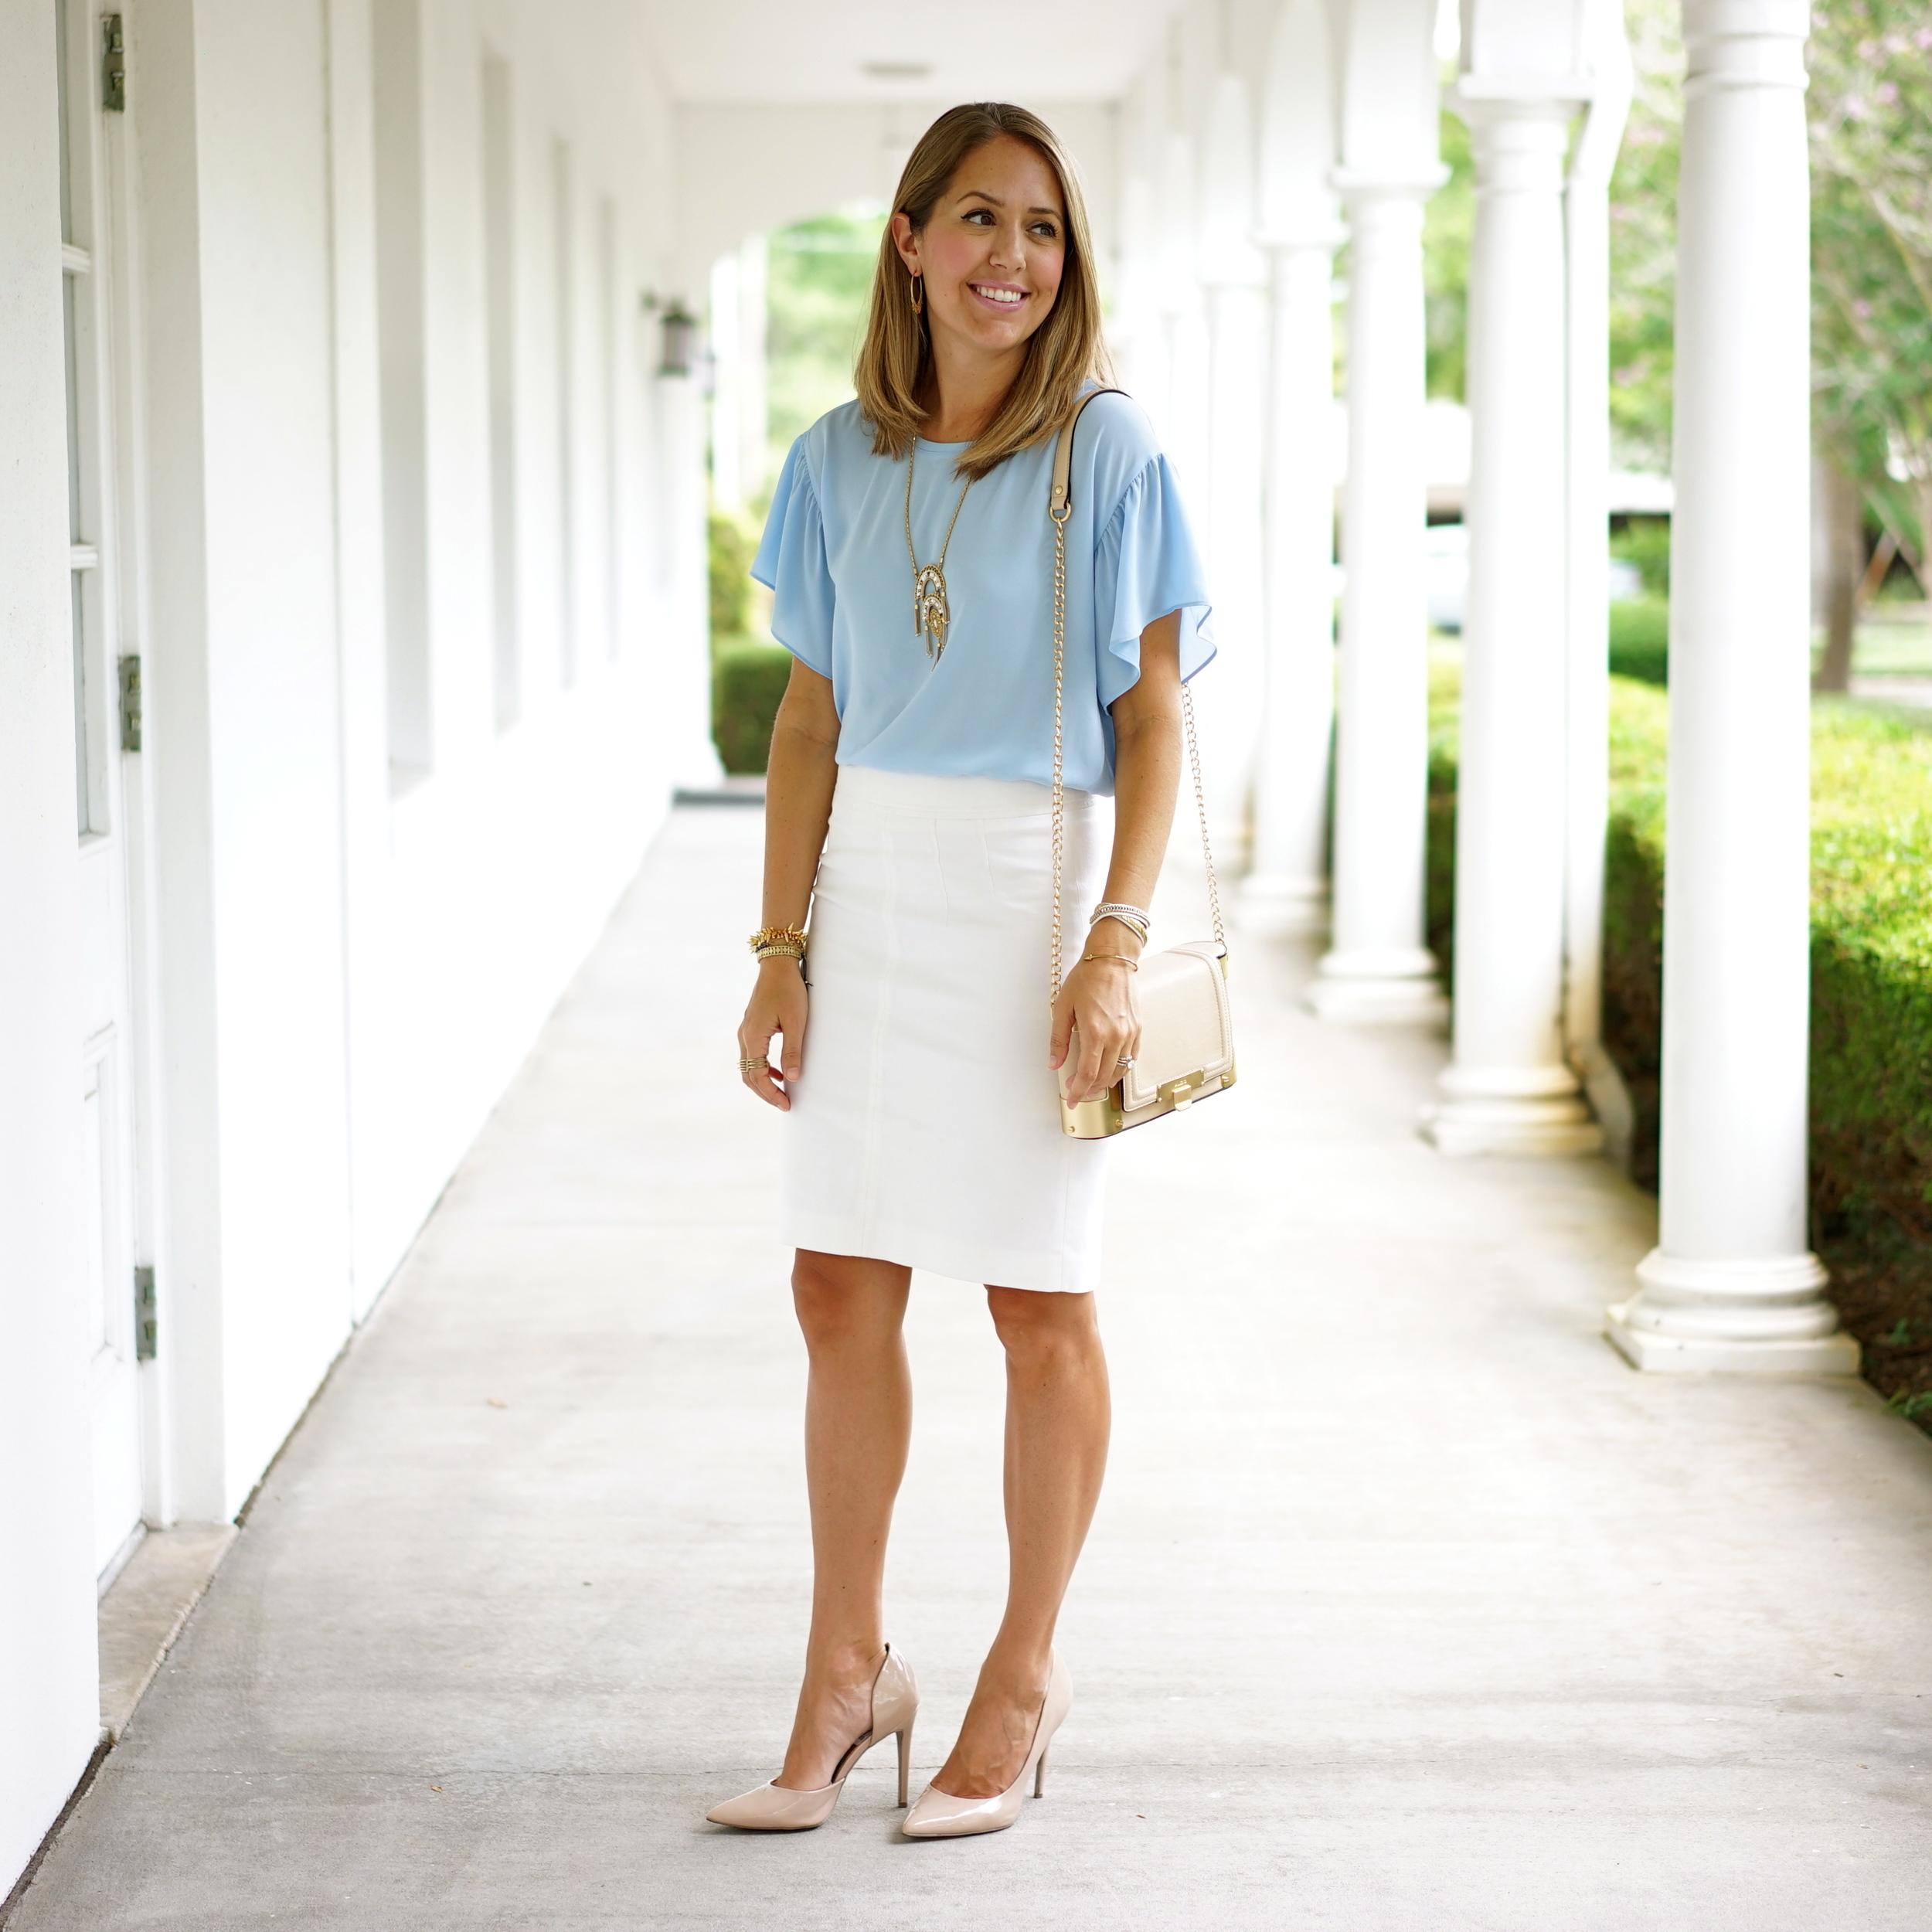 Ruffle sleeve baby blue top, white pencil skirt